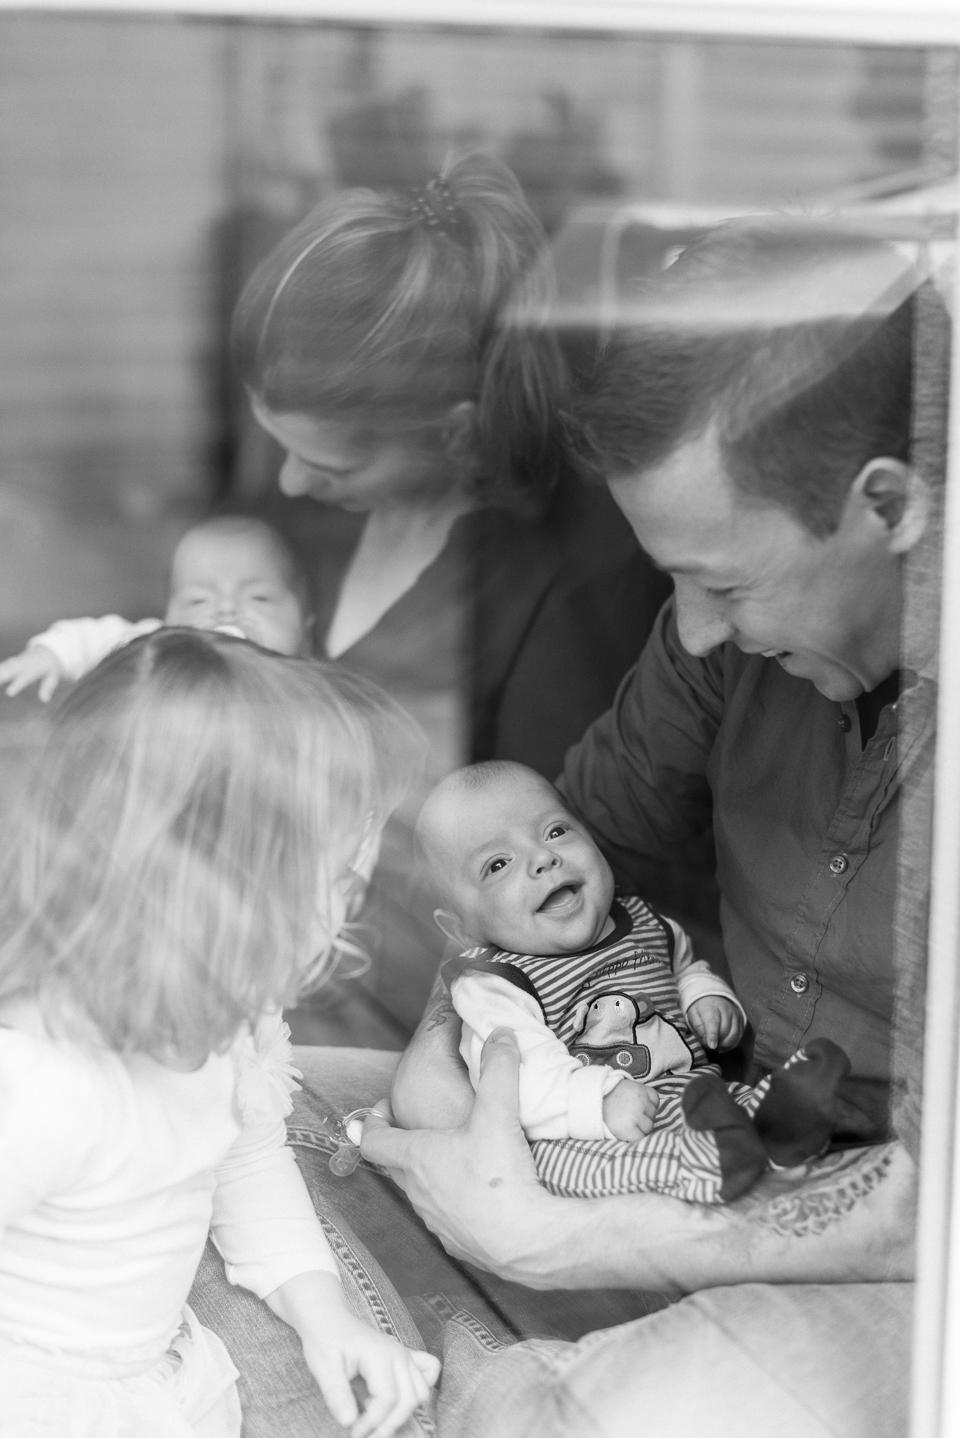 BabyshootingMoritz&Philipp_DSC7289HP